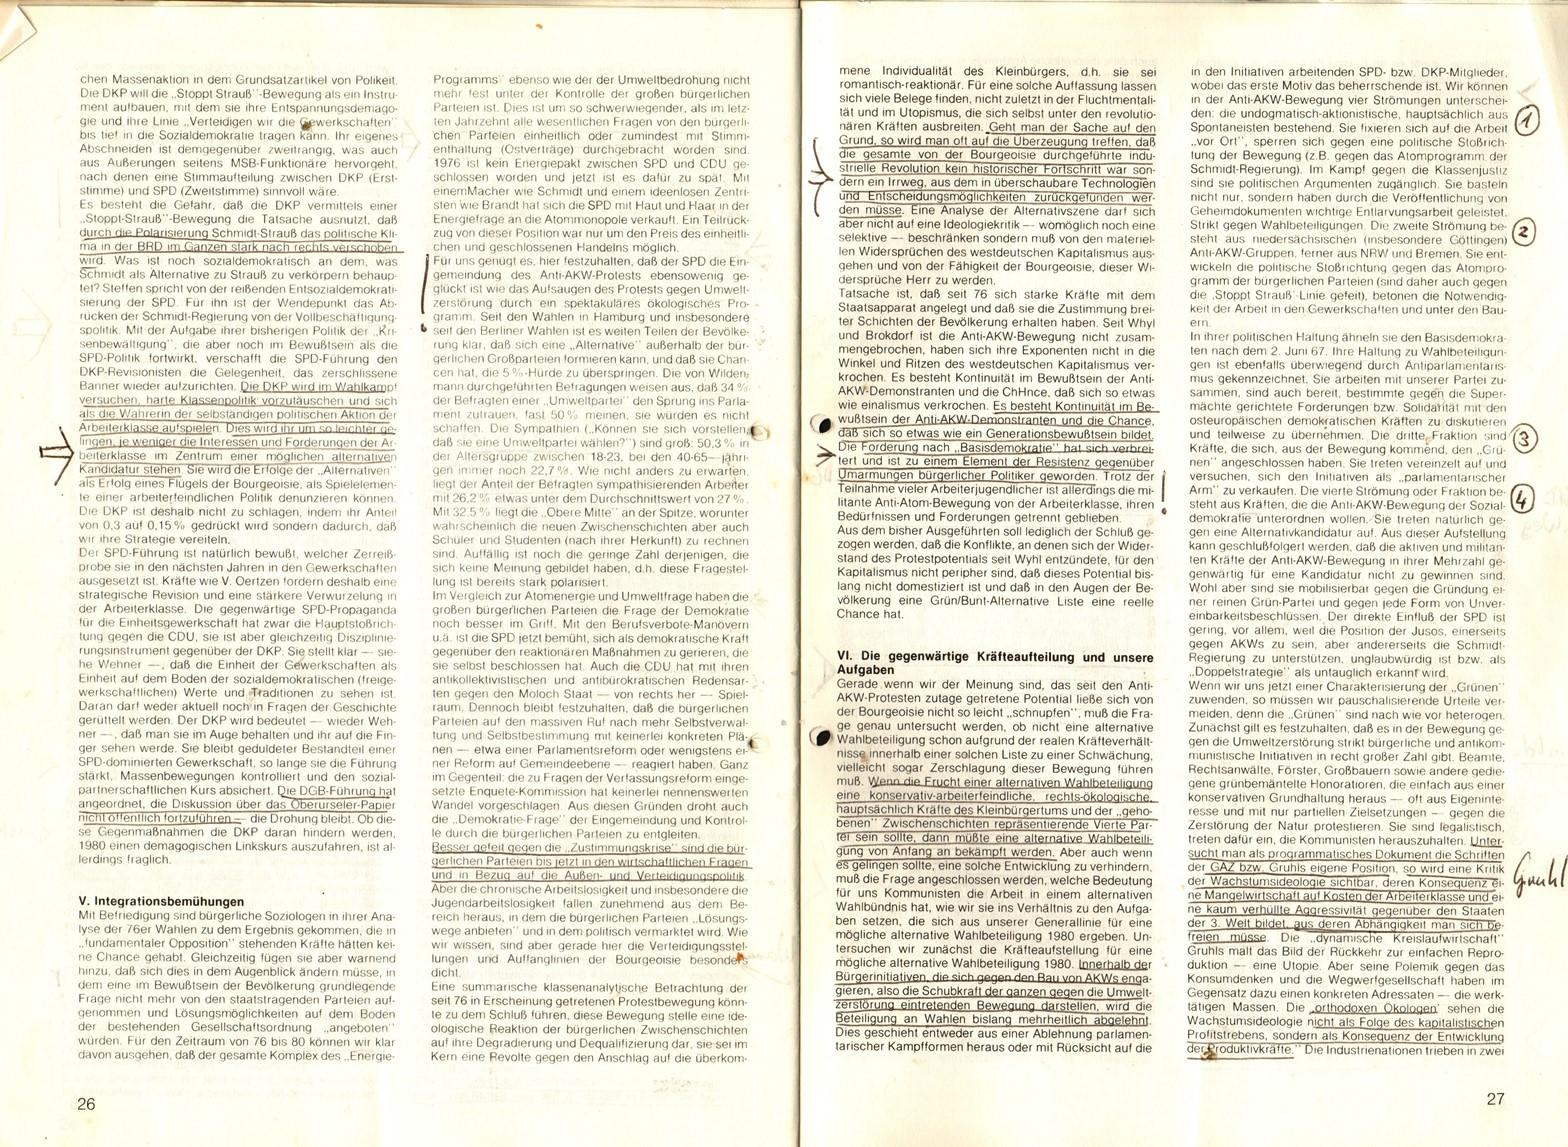 KPDAO_1979_Diskussion_Bundestagswahlen_1980_14